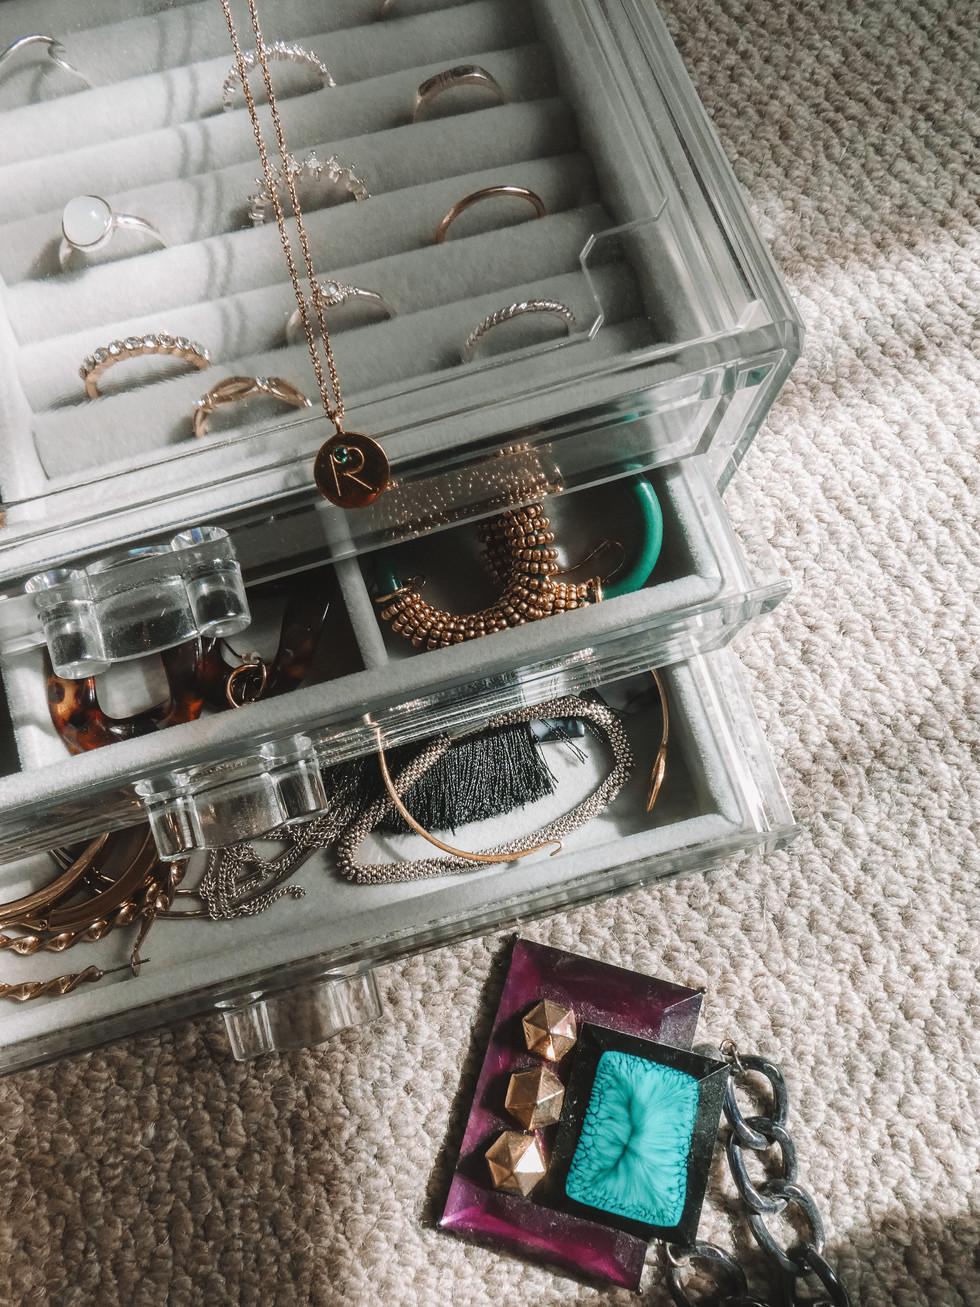 Favourite jewellery brands